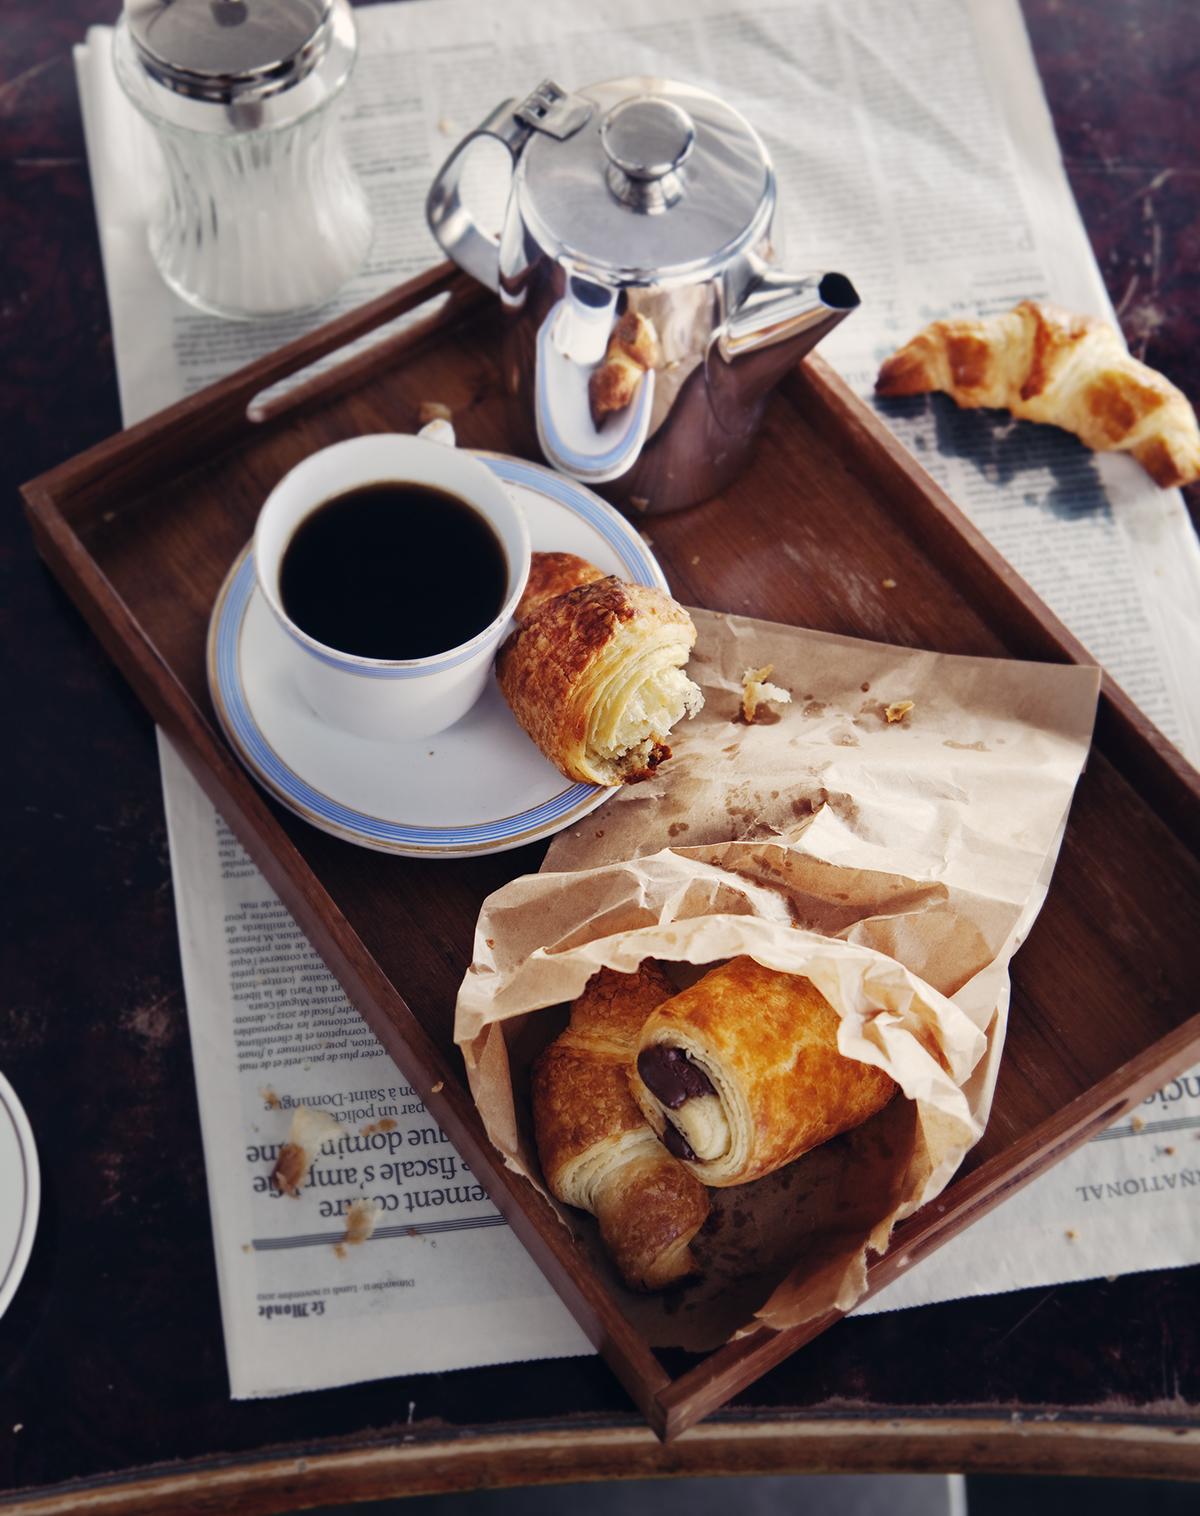 Croissant and pain au chocolat - Photographer Ulrika Ekblom Recipe Mia ...